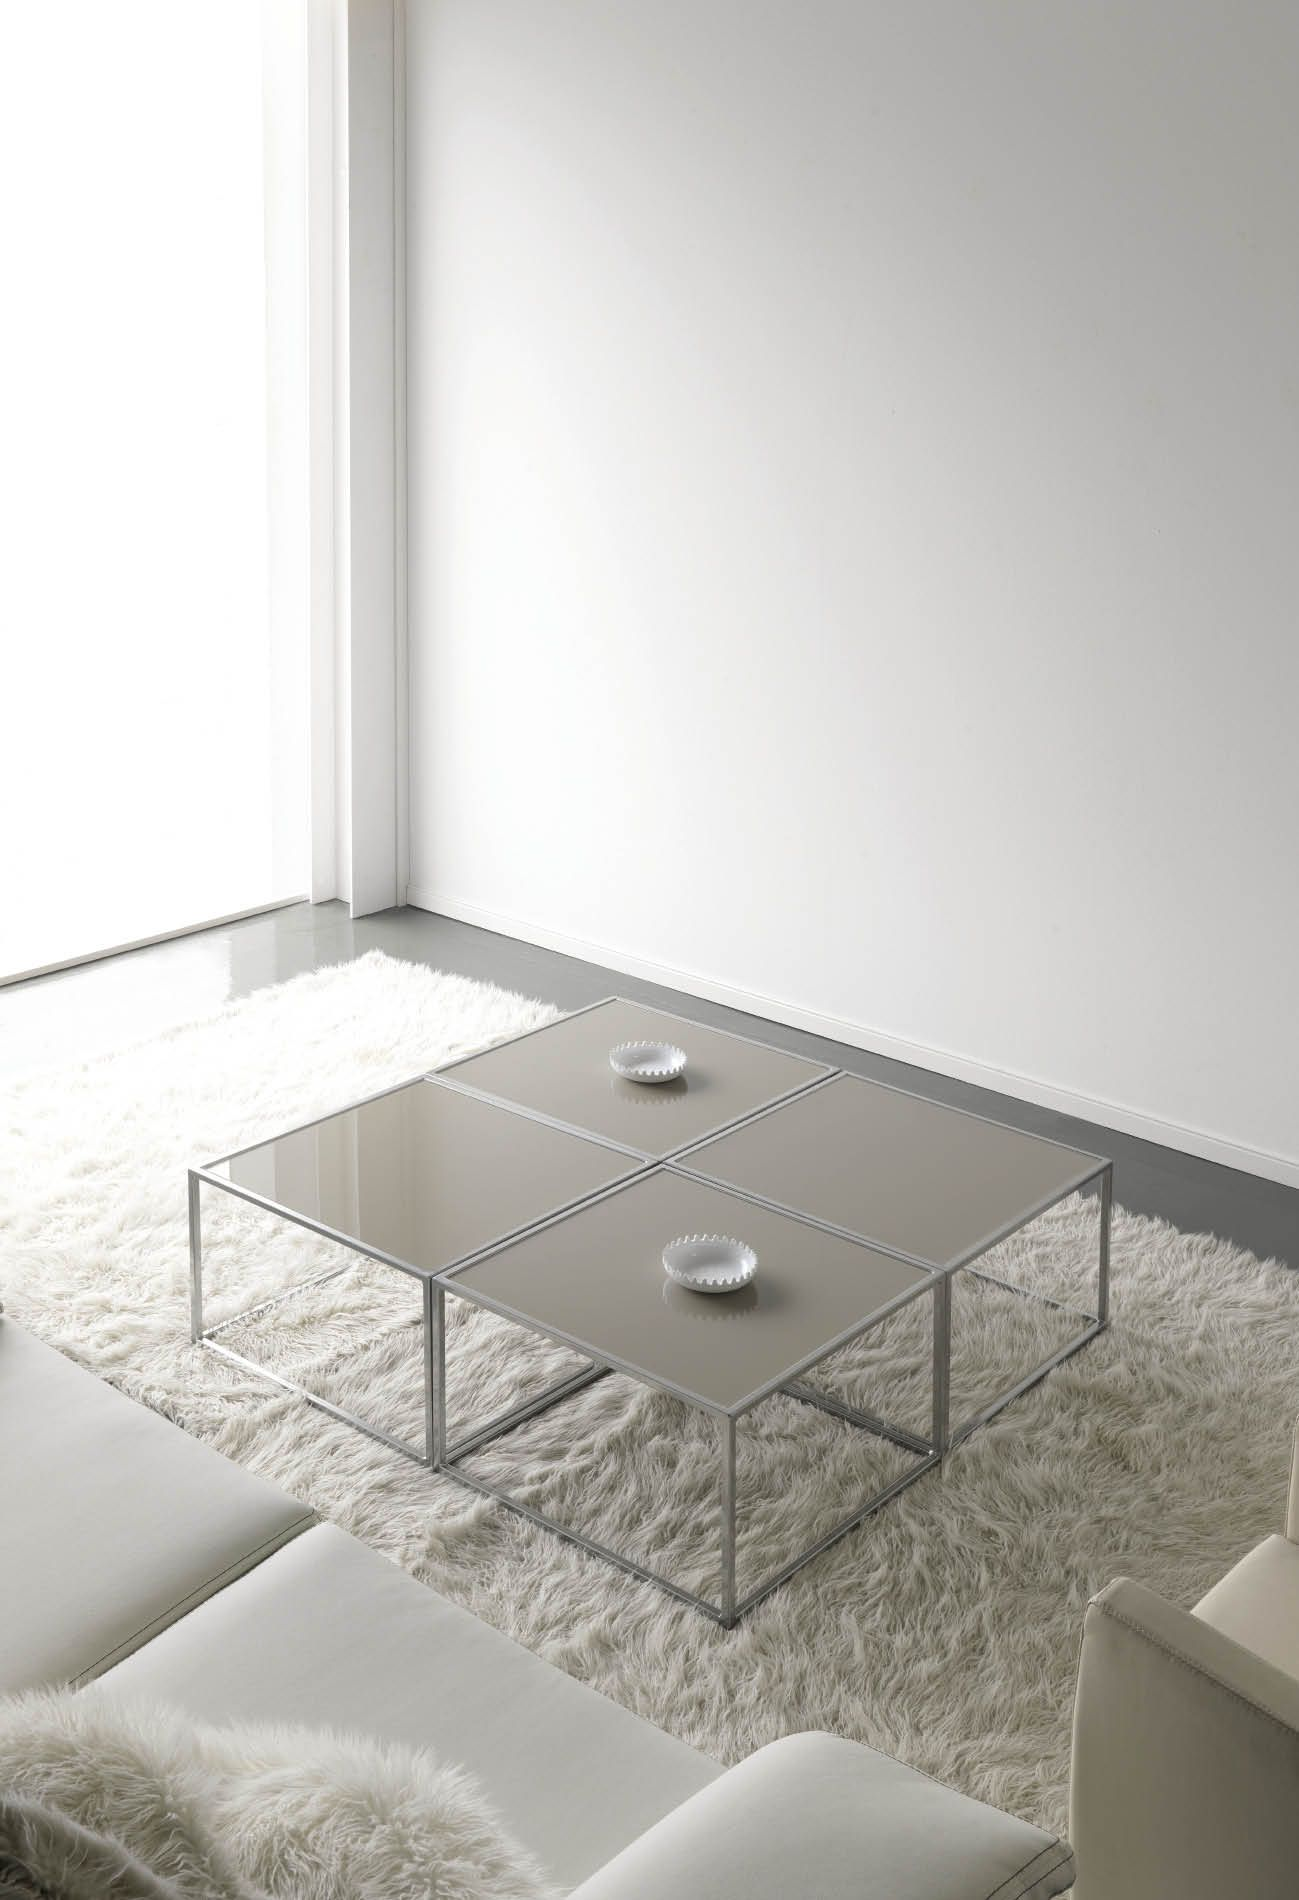 Famoso Muebles De Cuero Con Pelo Insertado Mesa De Café Otomana ...